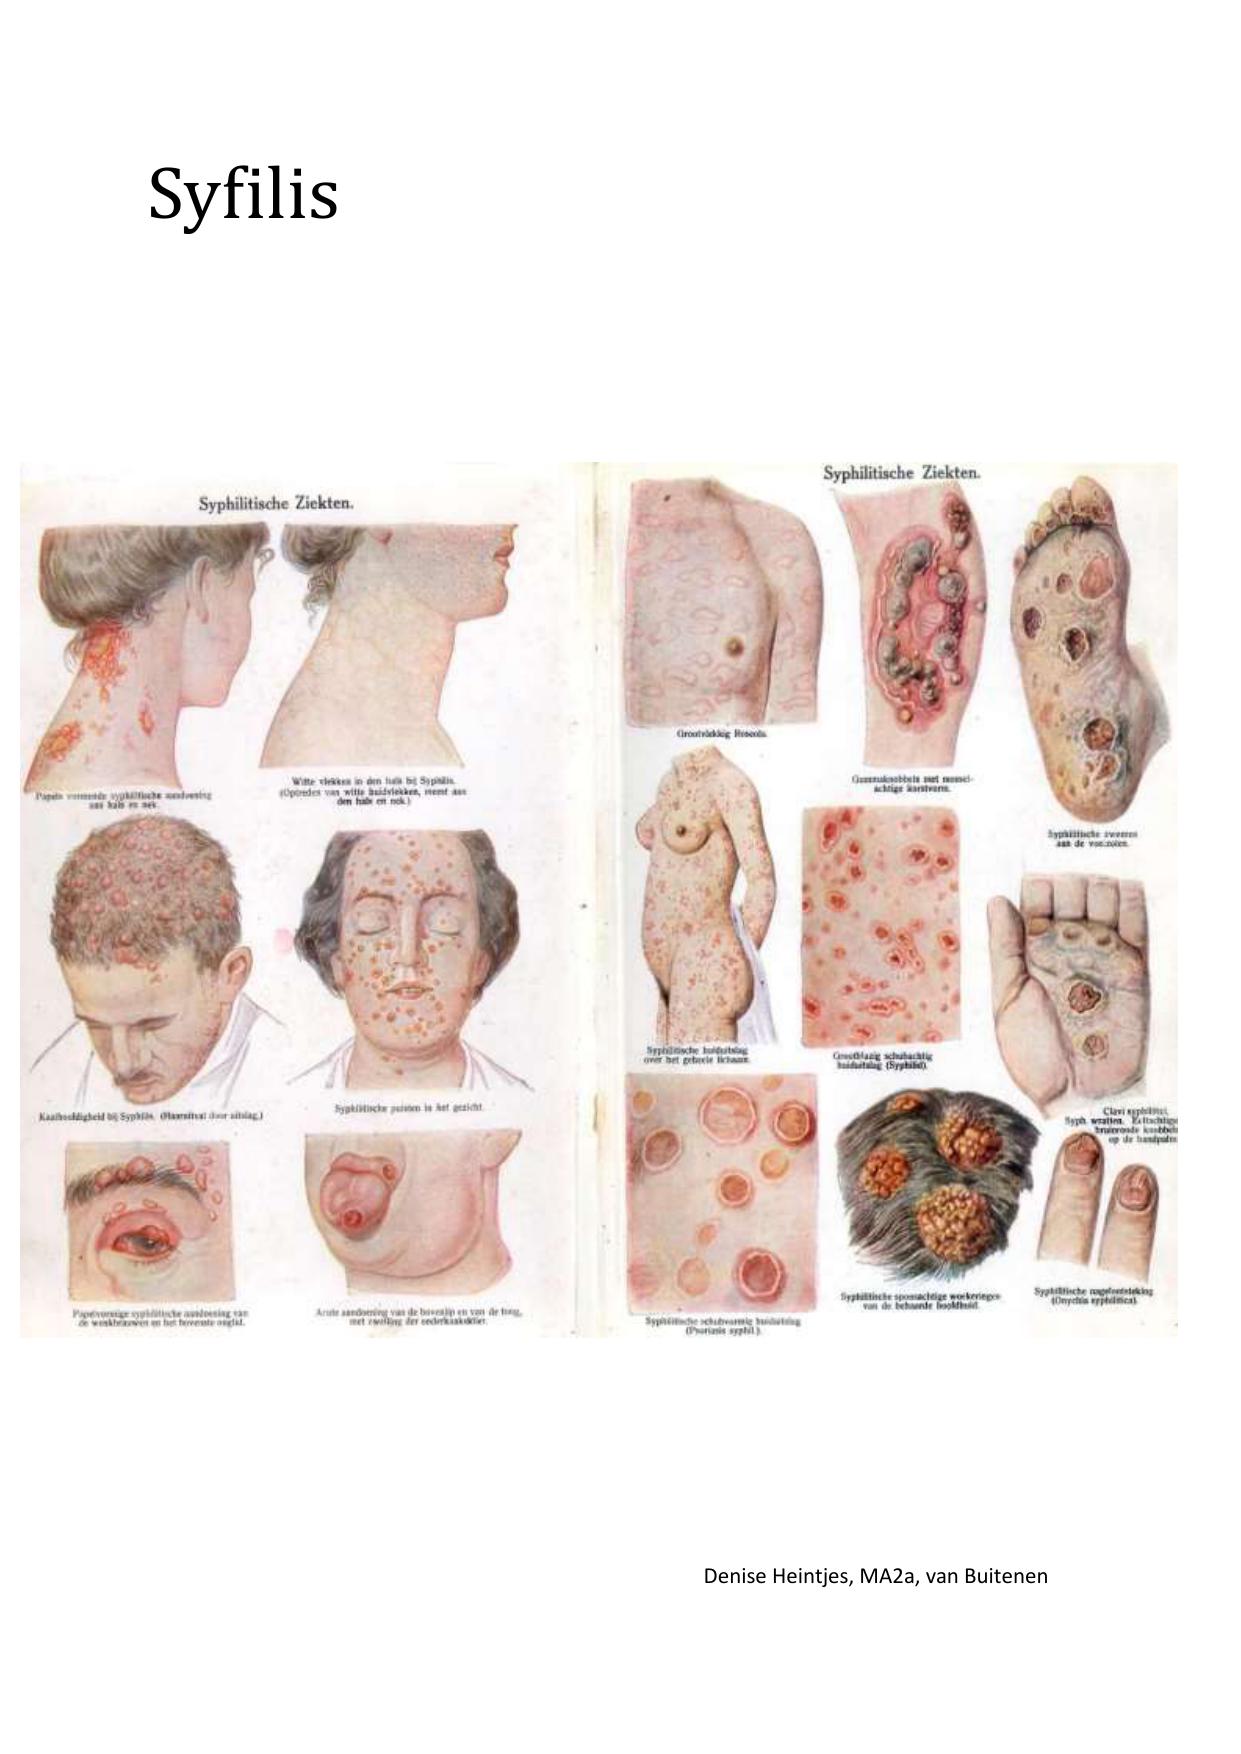 Syfilis Syphilis (Treponema